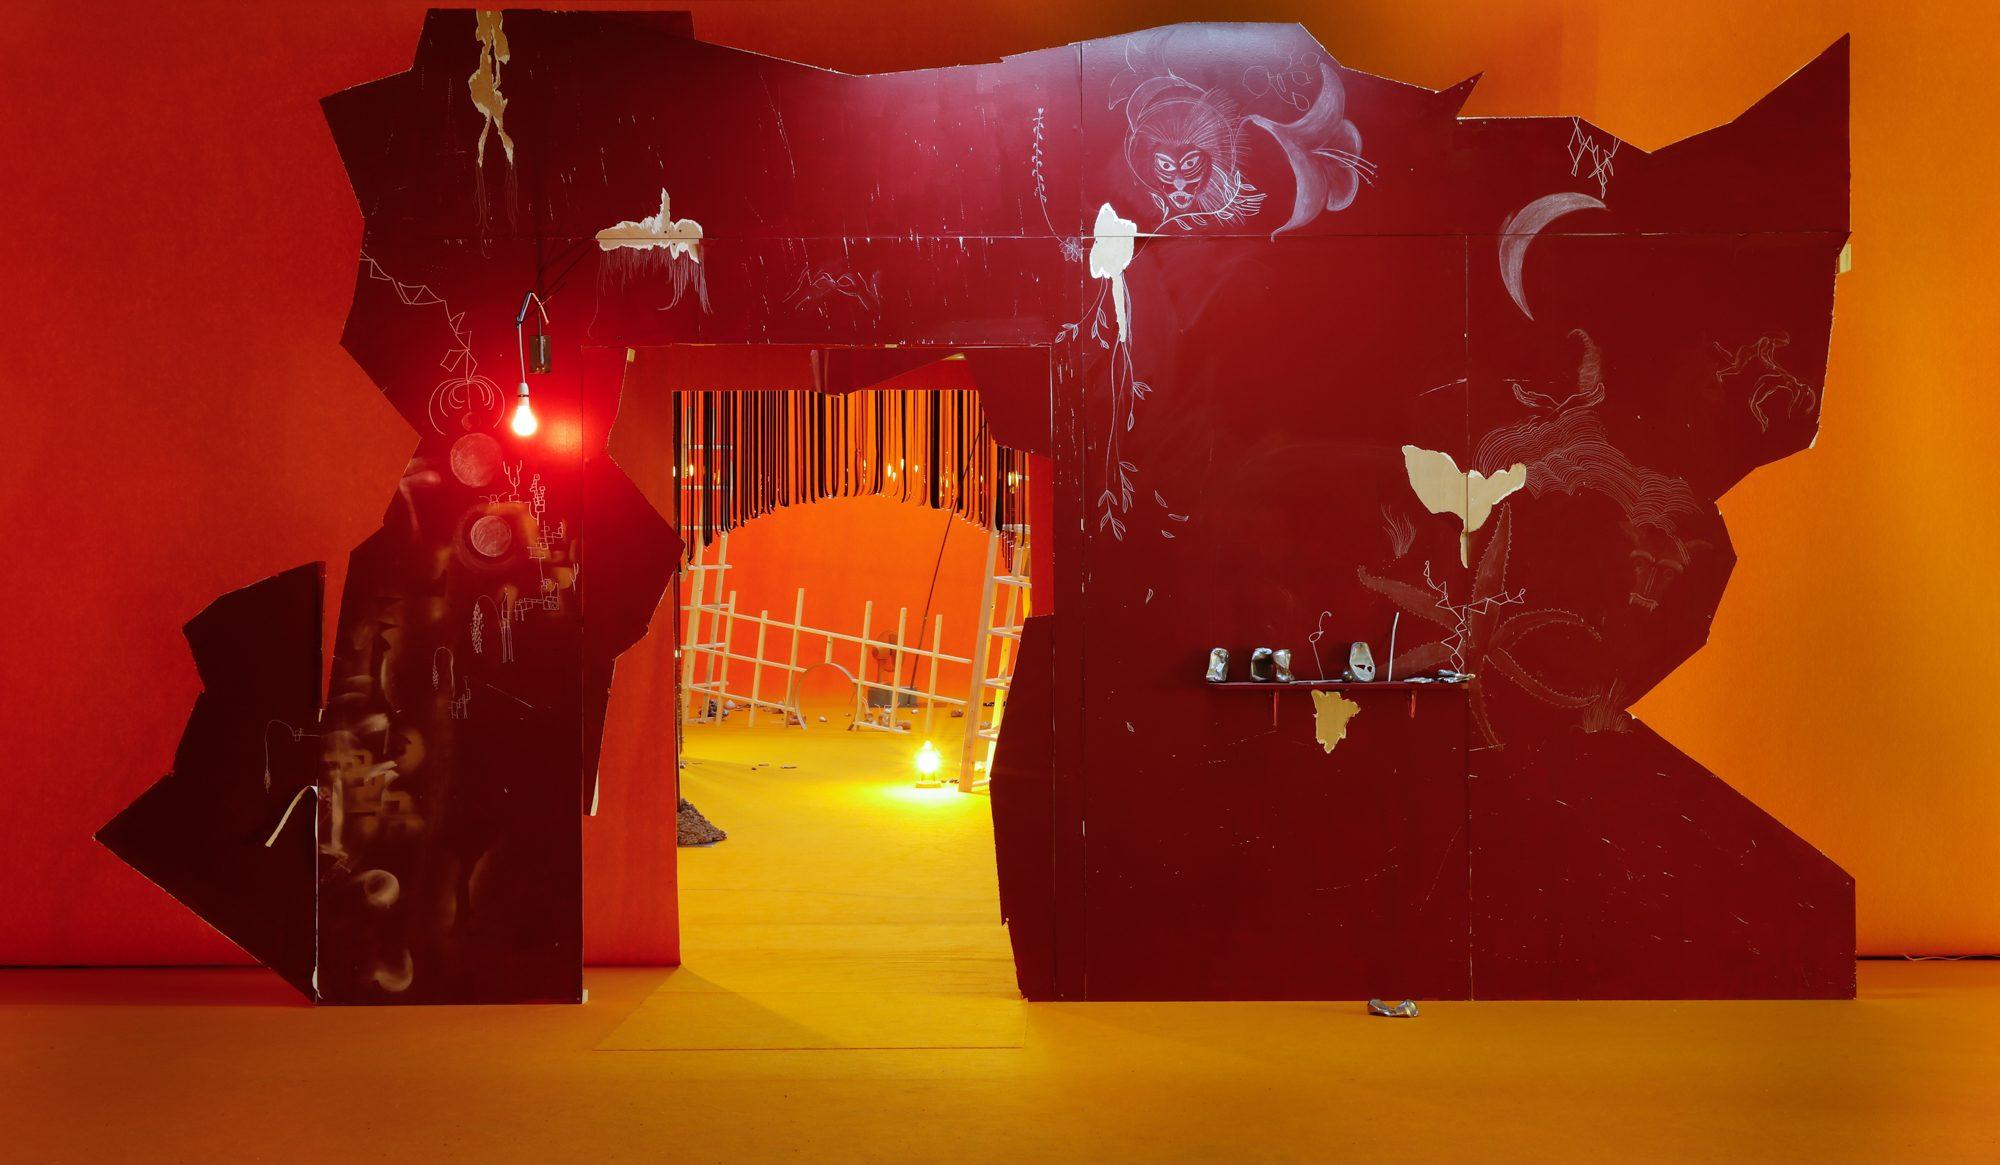 anne hardy museum Boijmans van Beuningen sensory spaces